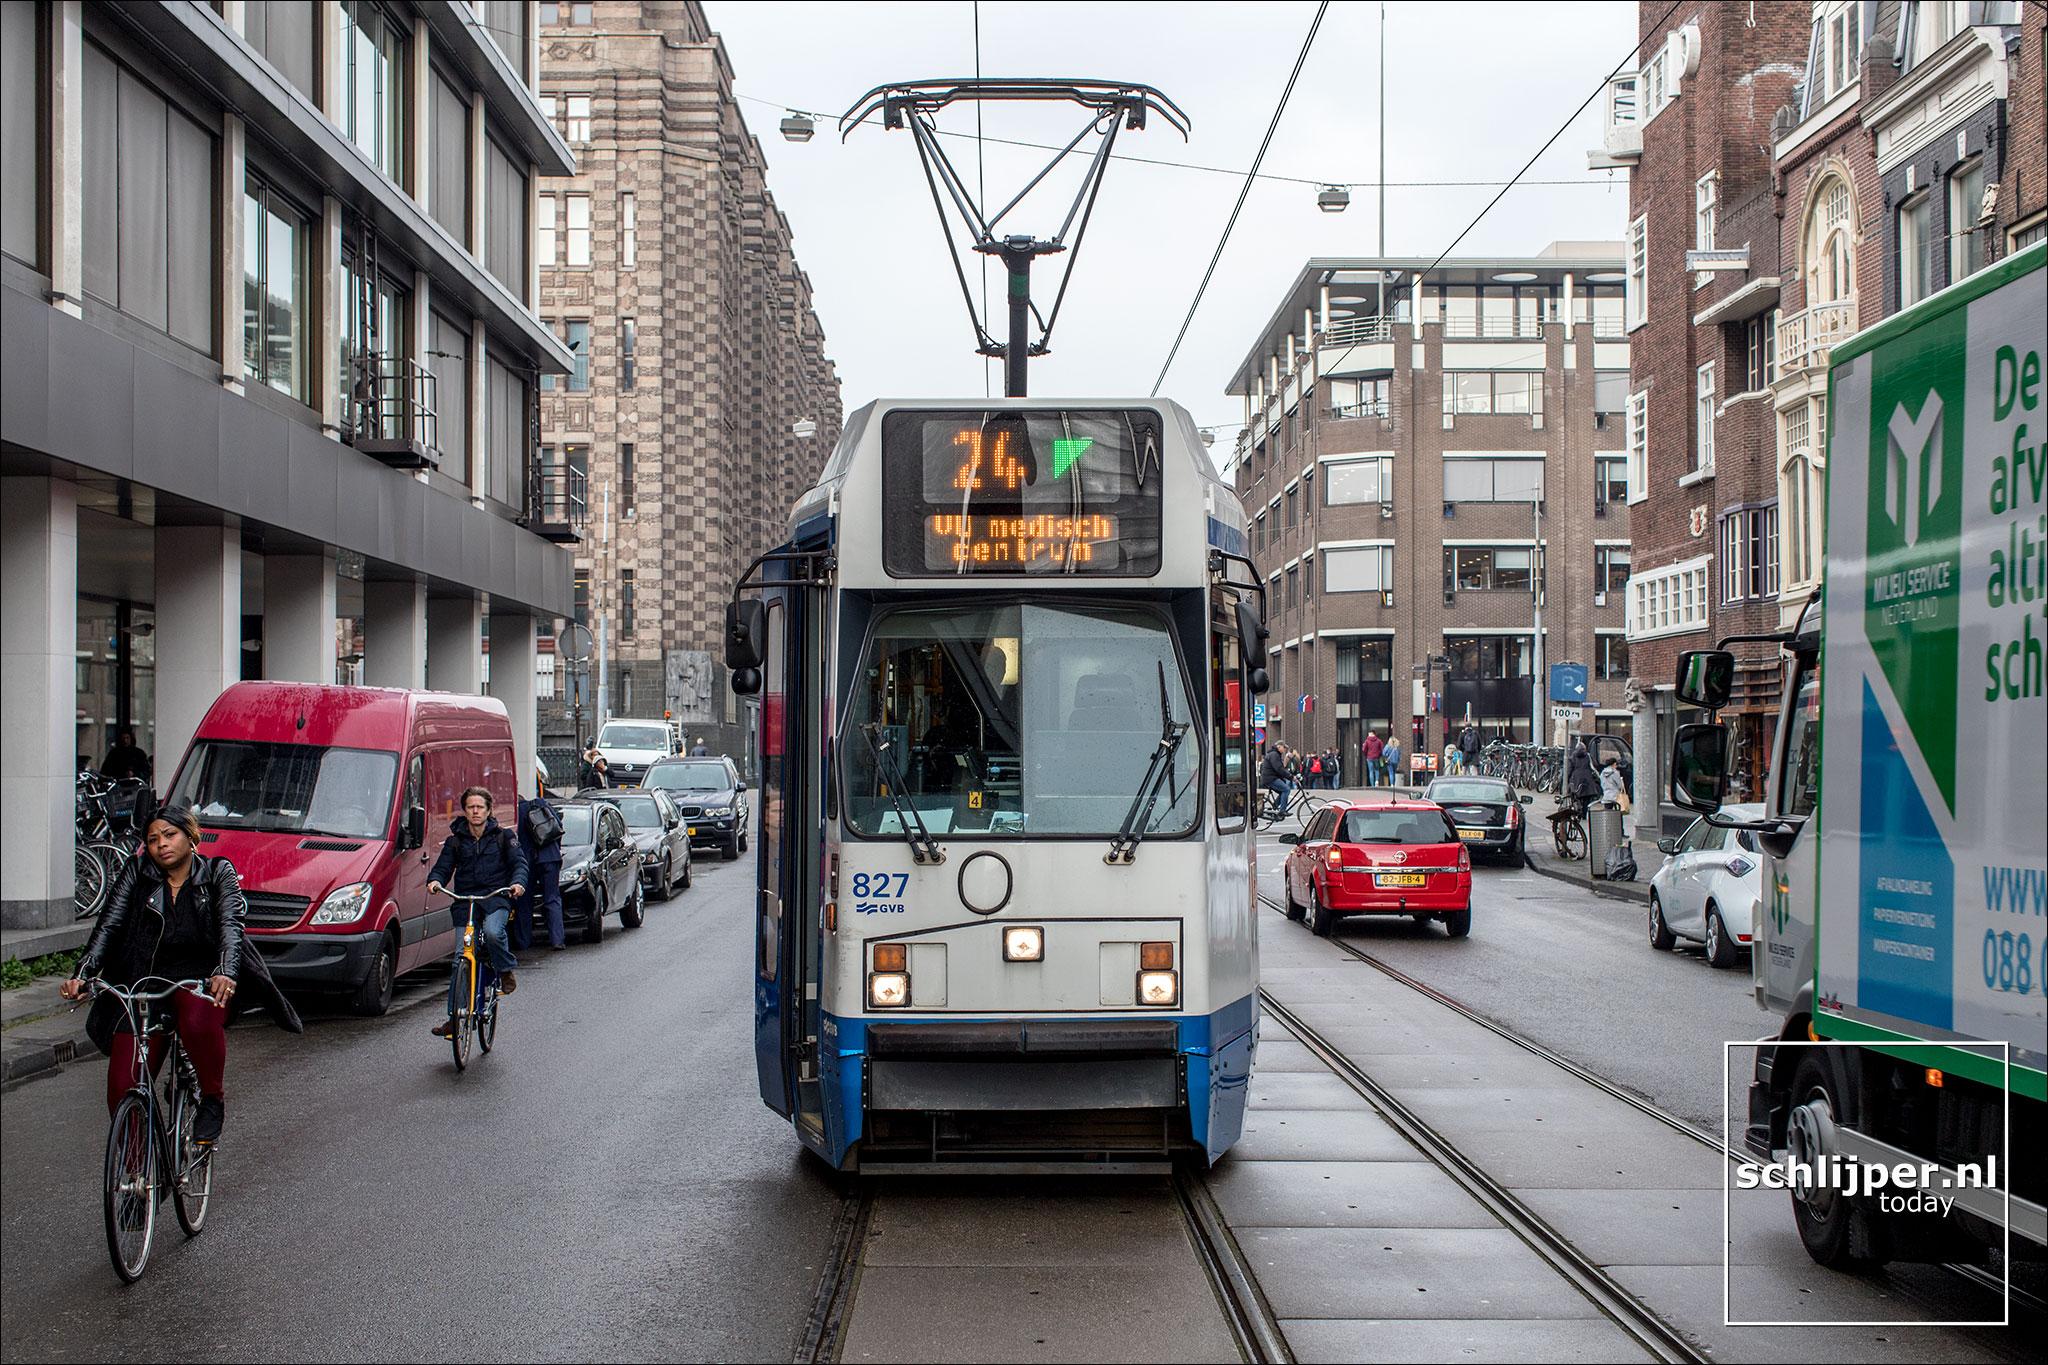 The Netherlands, Amsterdam, 2 april 2019